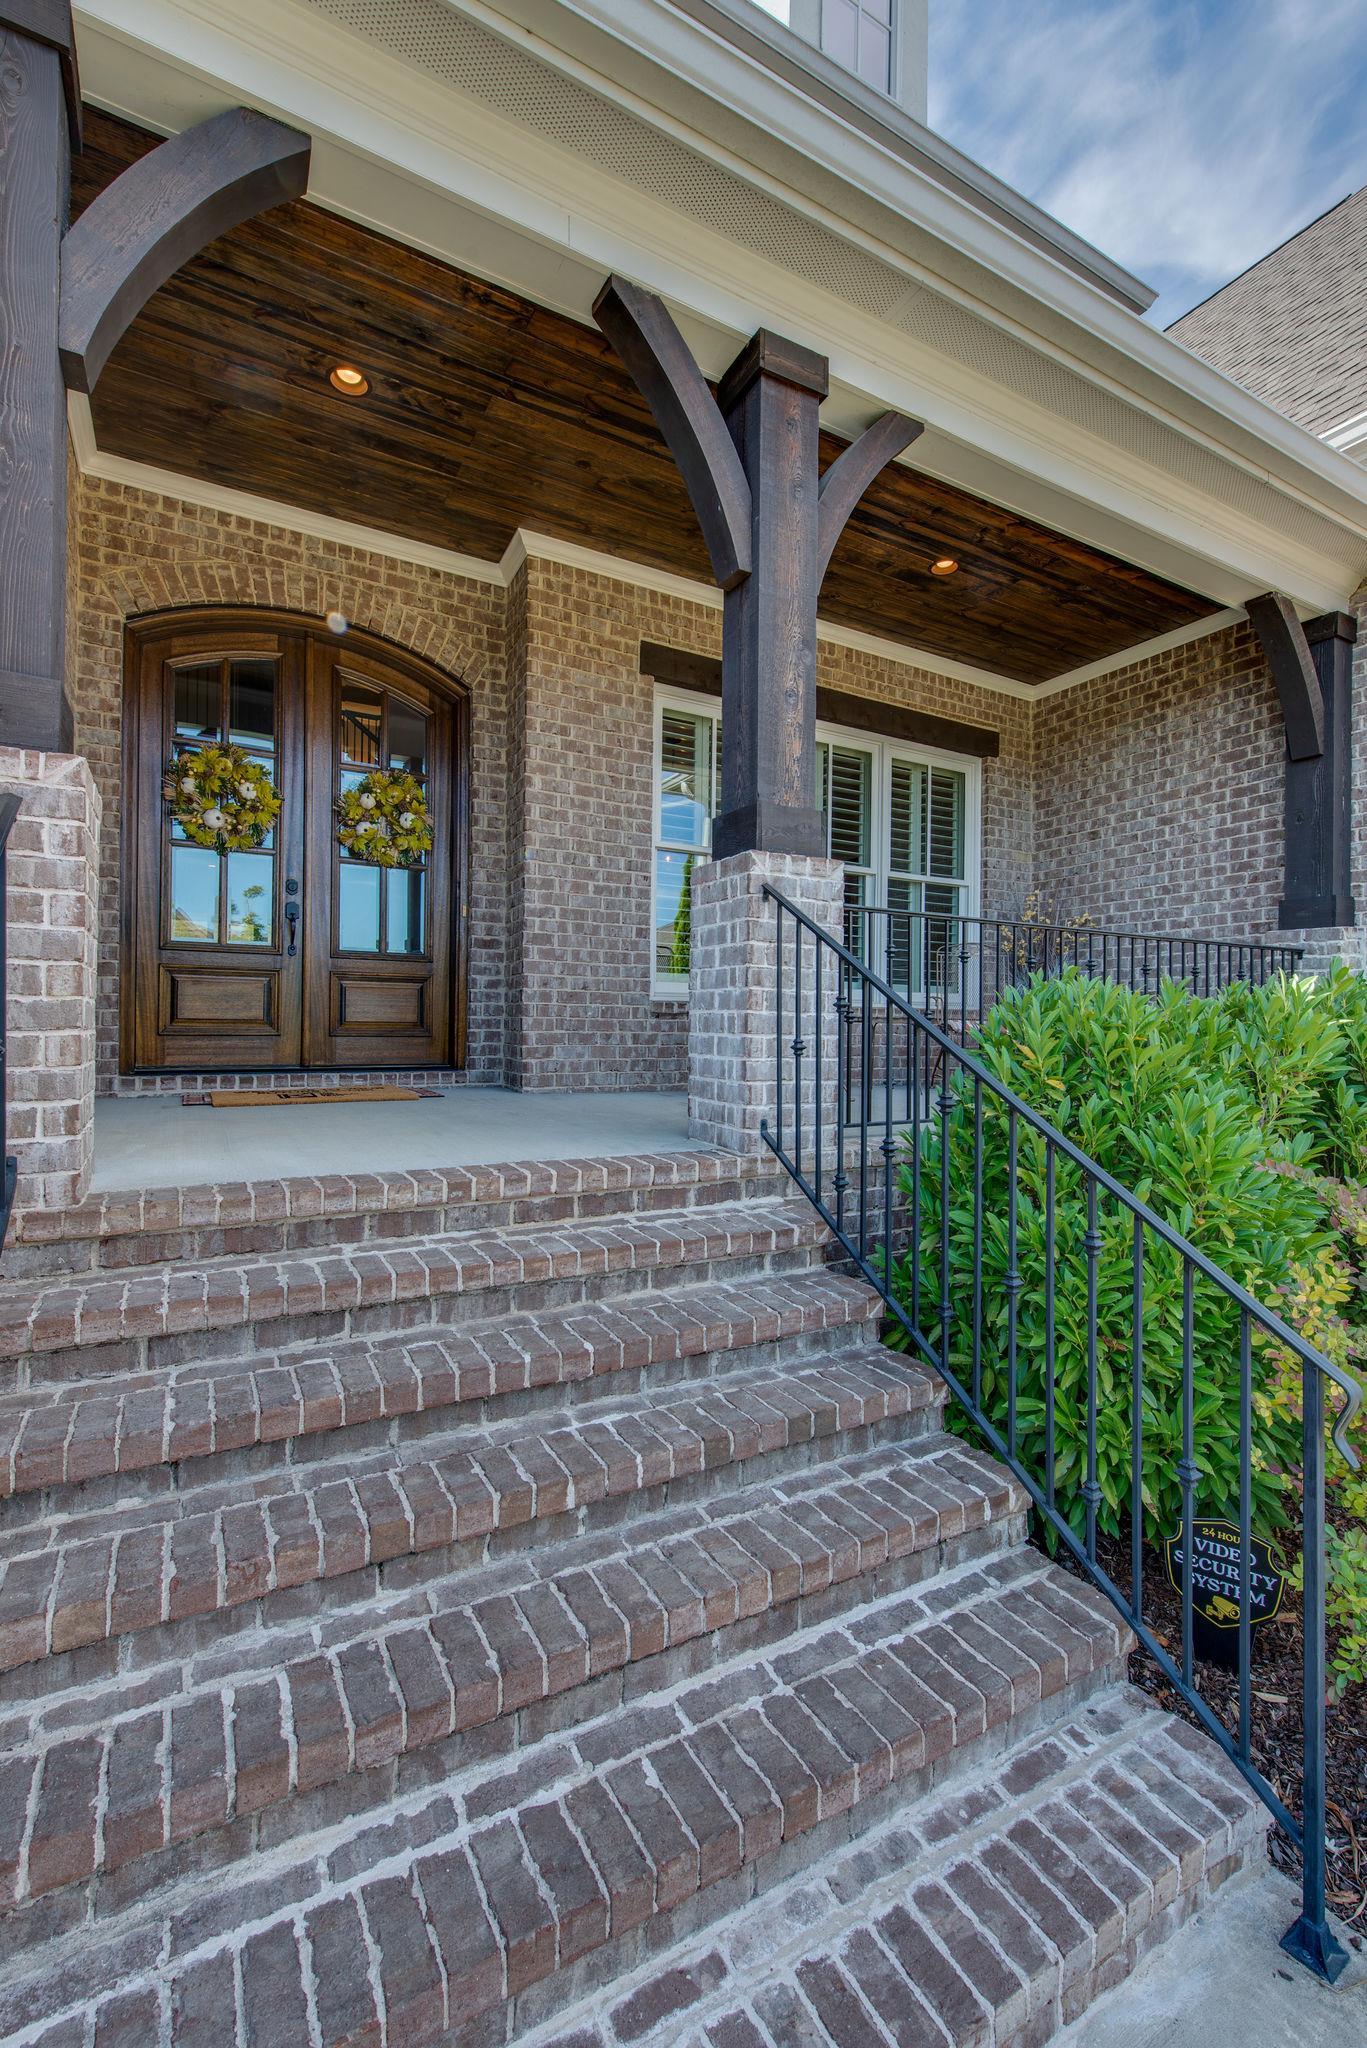 2171 Hartland Rd, Franklin, TN 37069 - Franklin, TN real estate listing